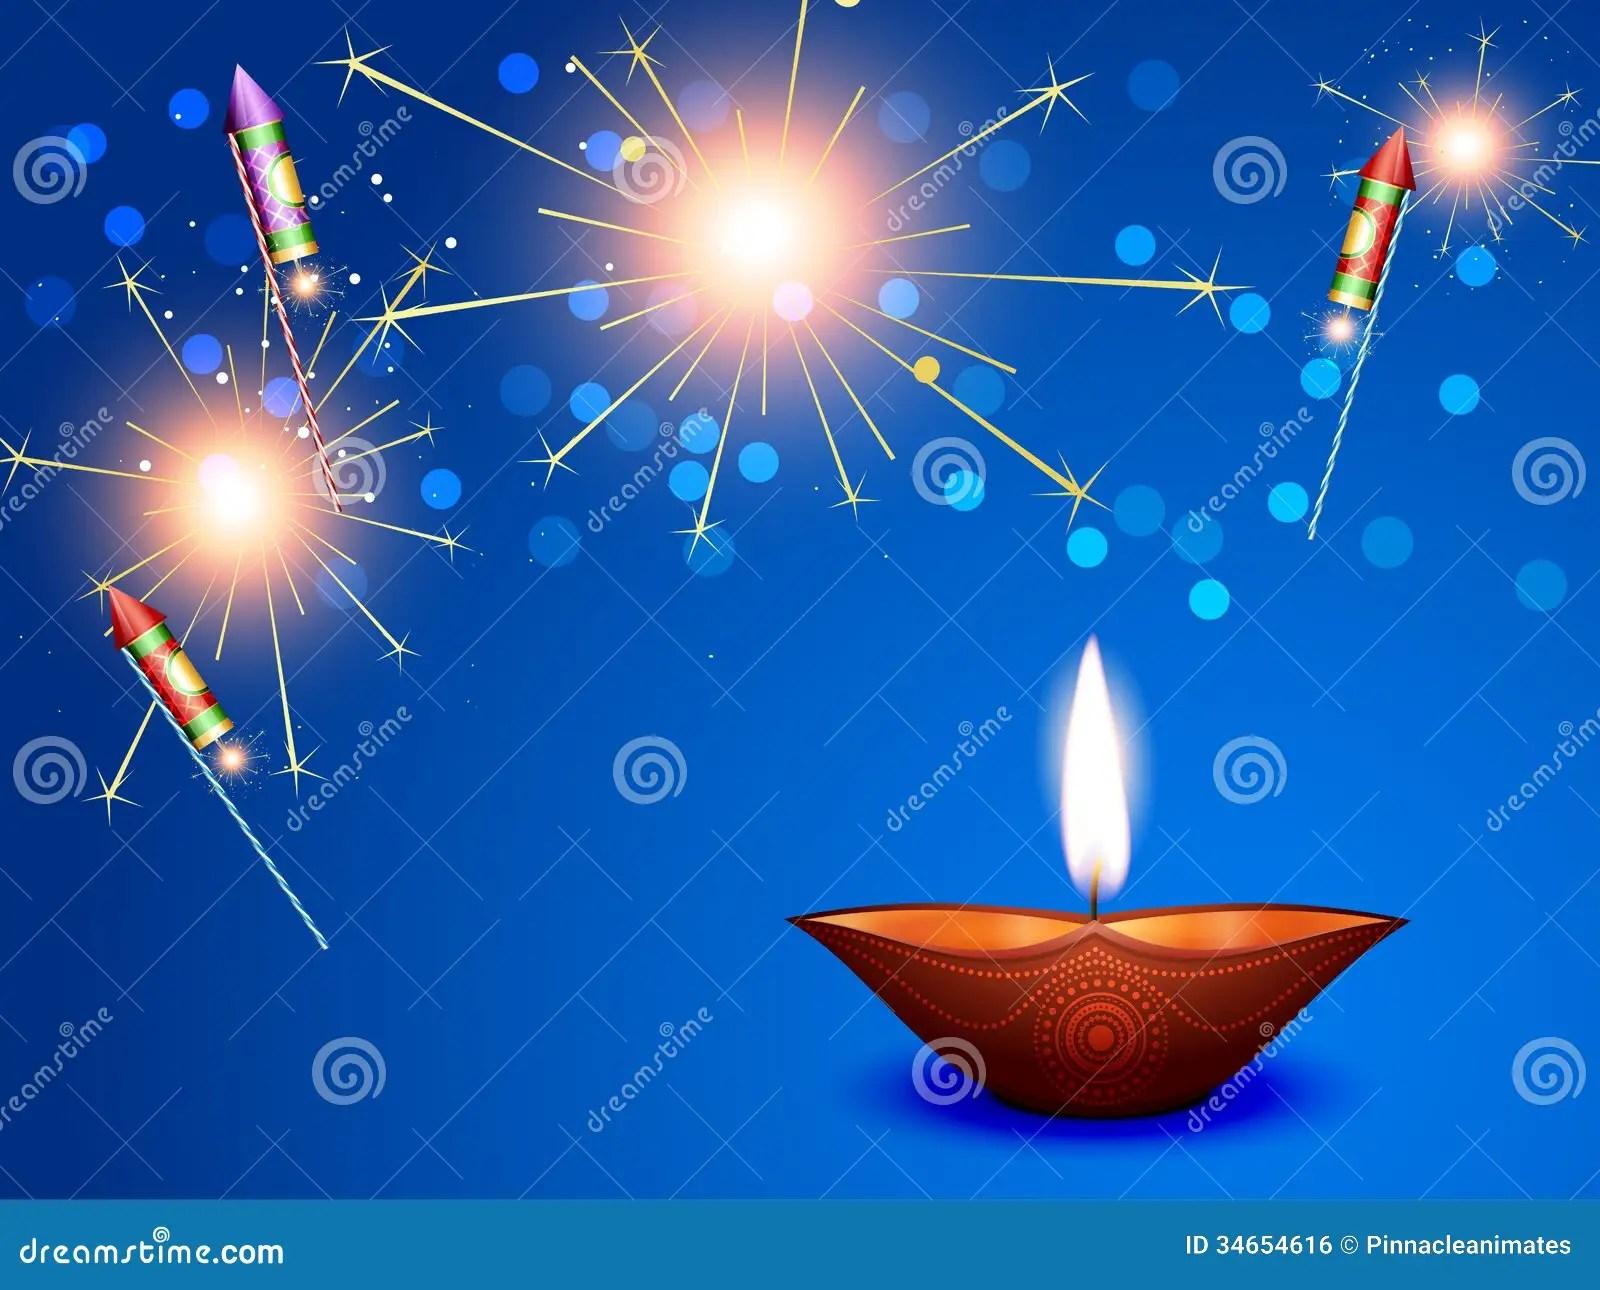 Diya Wallpaper Hd Happy Diwali Background Royalty Free Stock Image Image